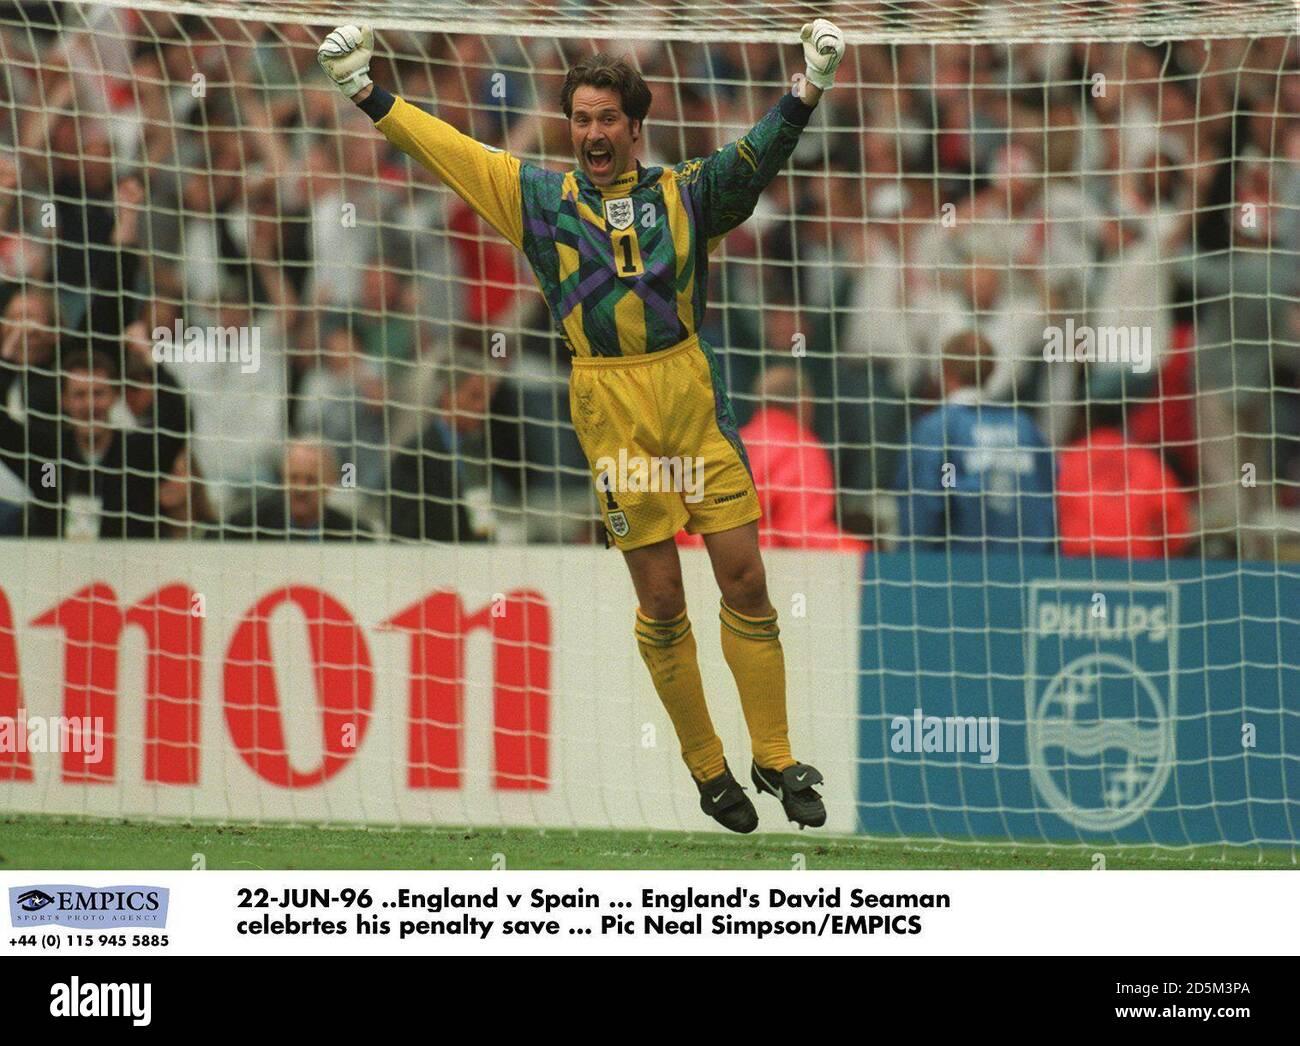 22-JUN-96 ..England v Spain ... David Seaman celebrates his penalty save Stock Photo